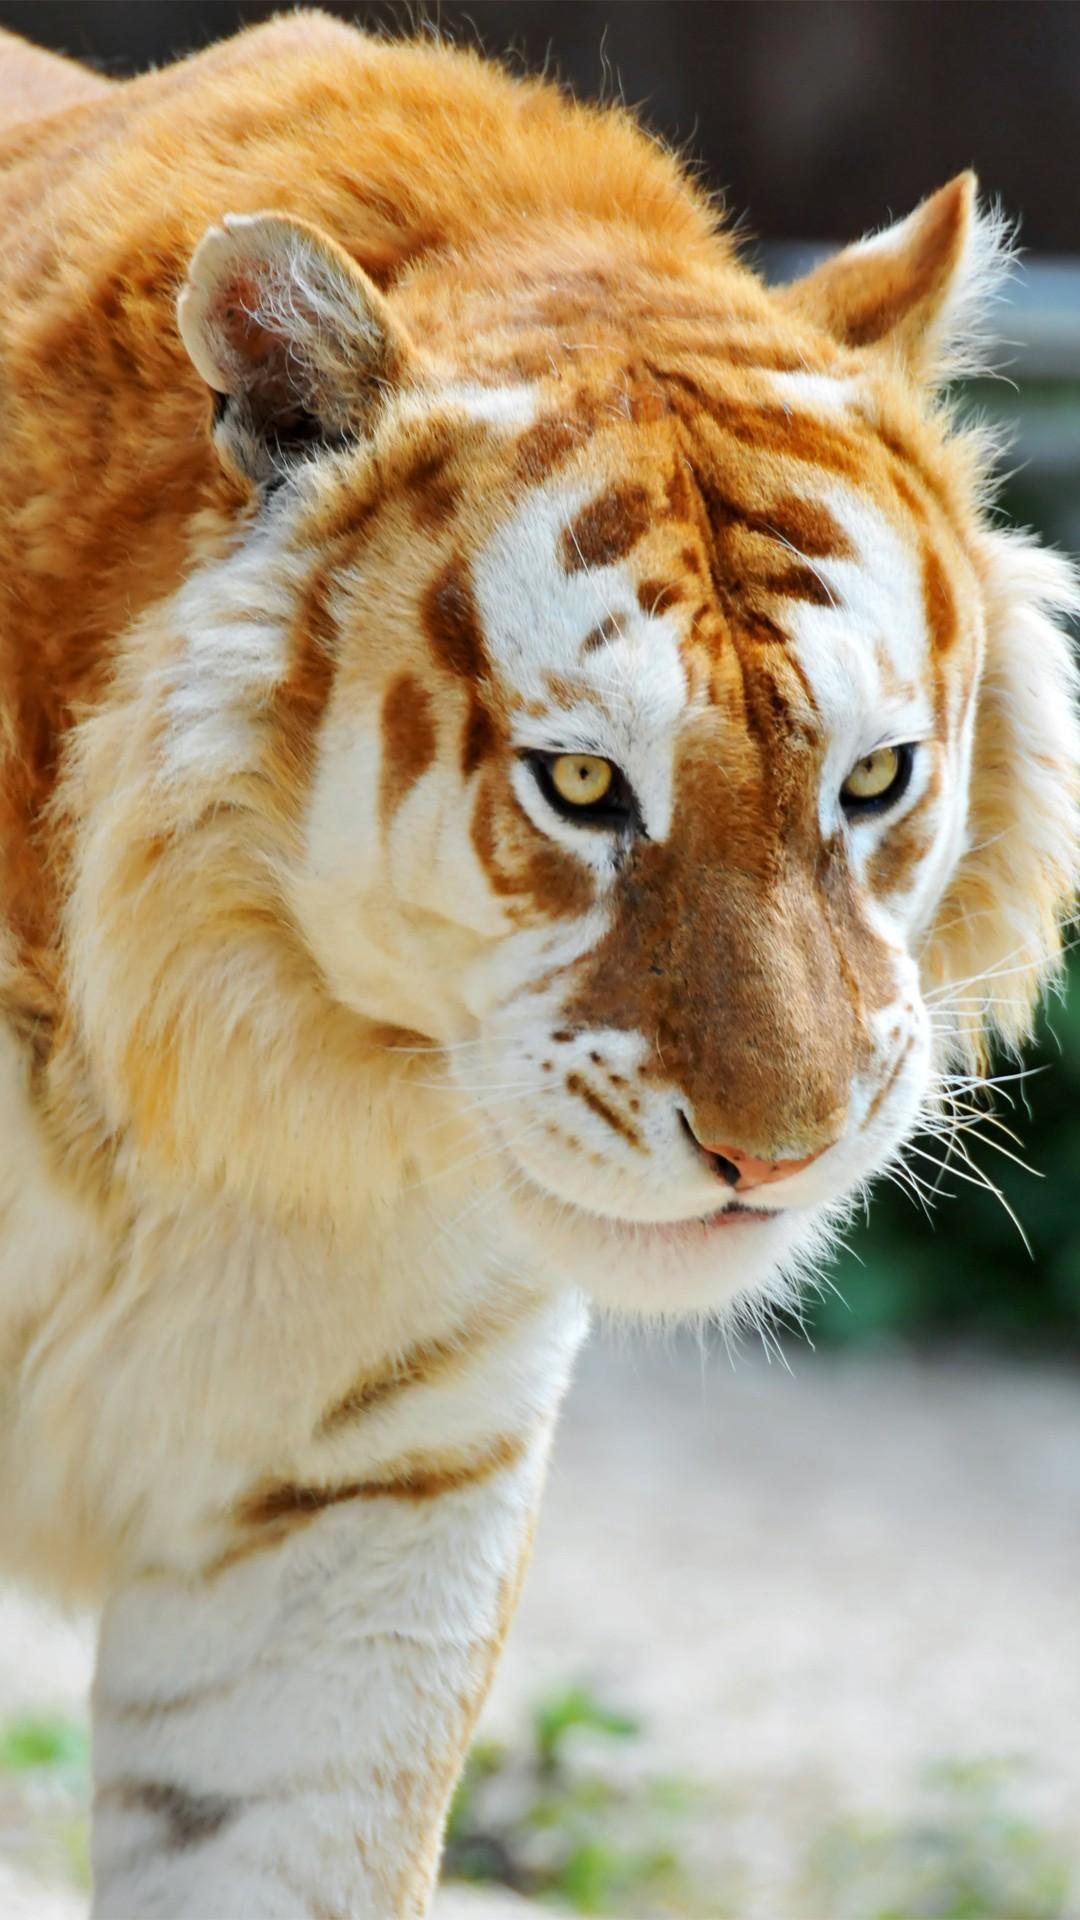 Tiger htc one wallpaper 1080x1920